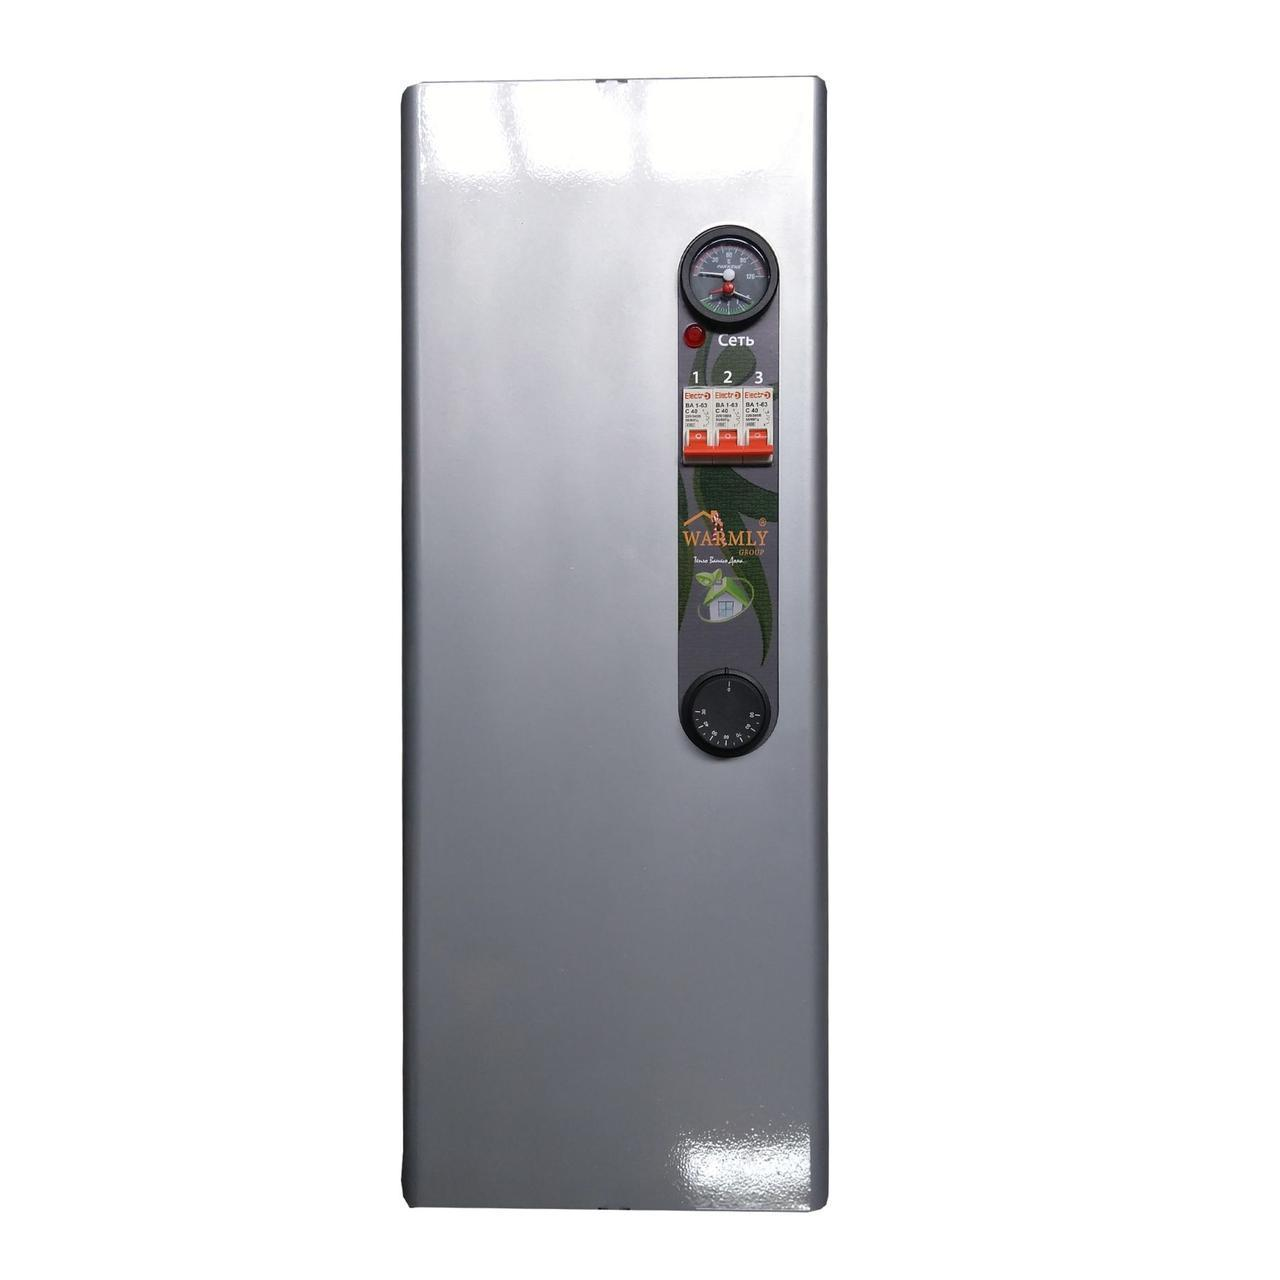 Котел електричний Warmly CLASSIK MG 6 кВт 220/380 В (з насосом + безшумний реле)